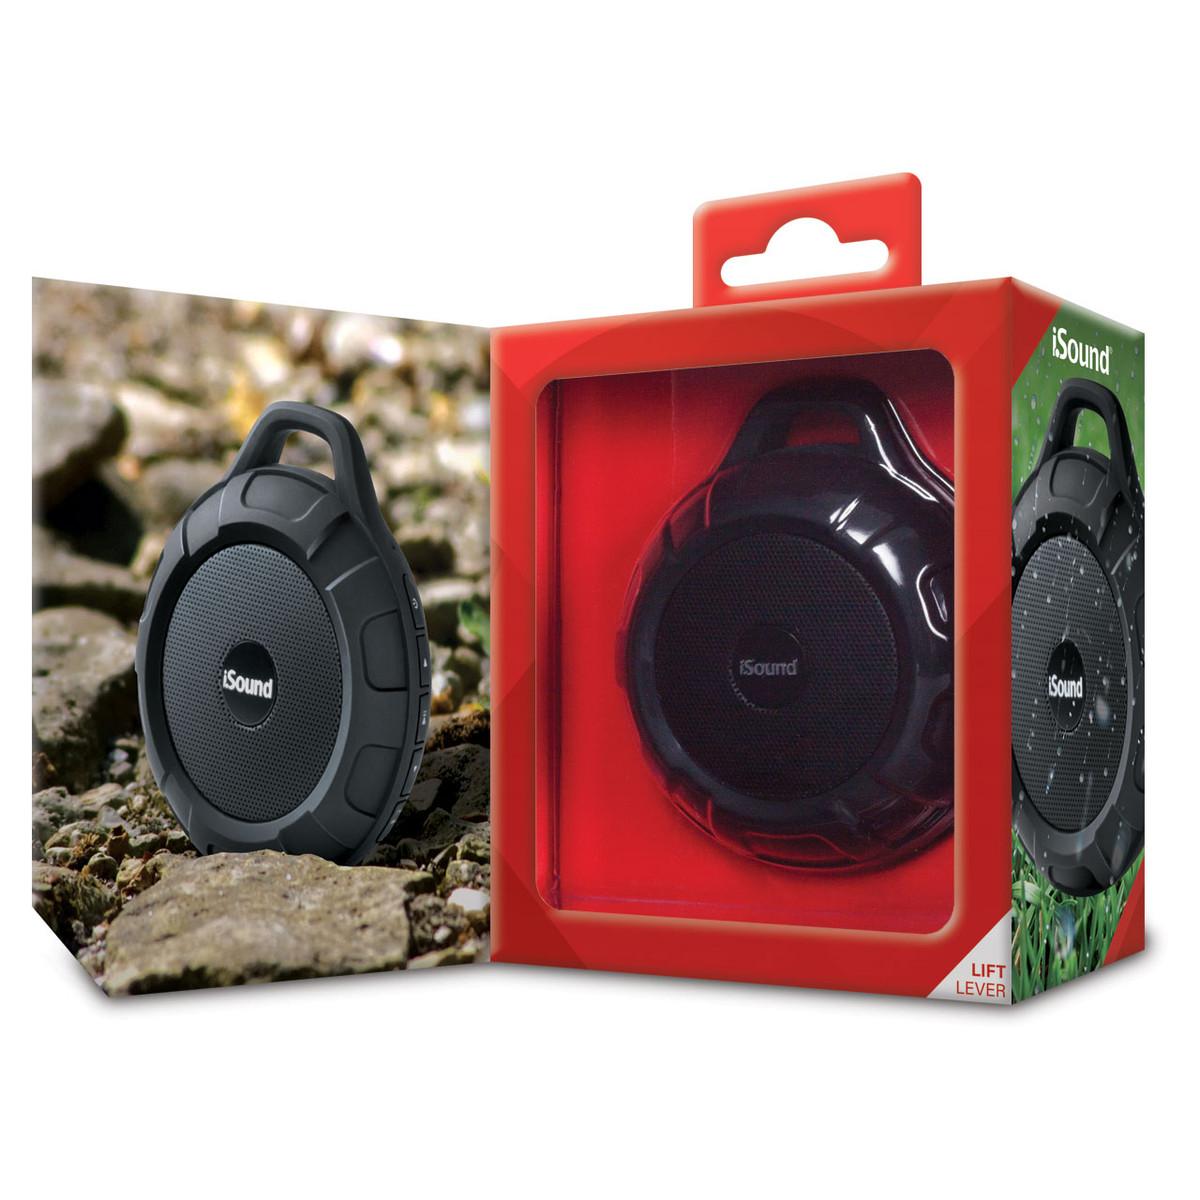 Duratunes Rechargeable Bluetooth Speaker Isound